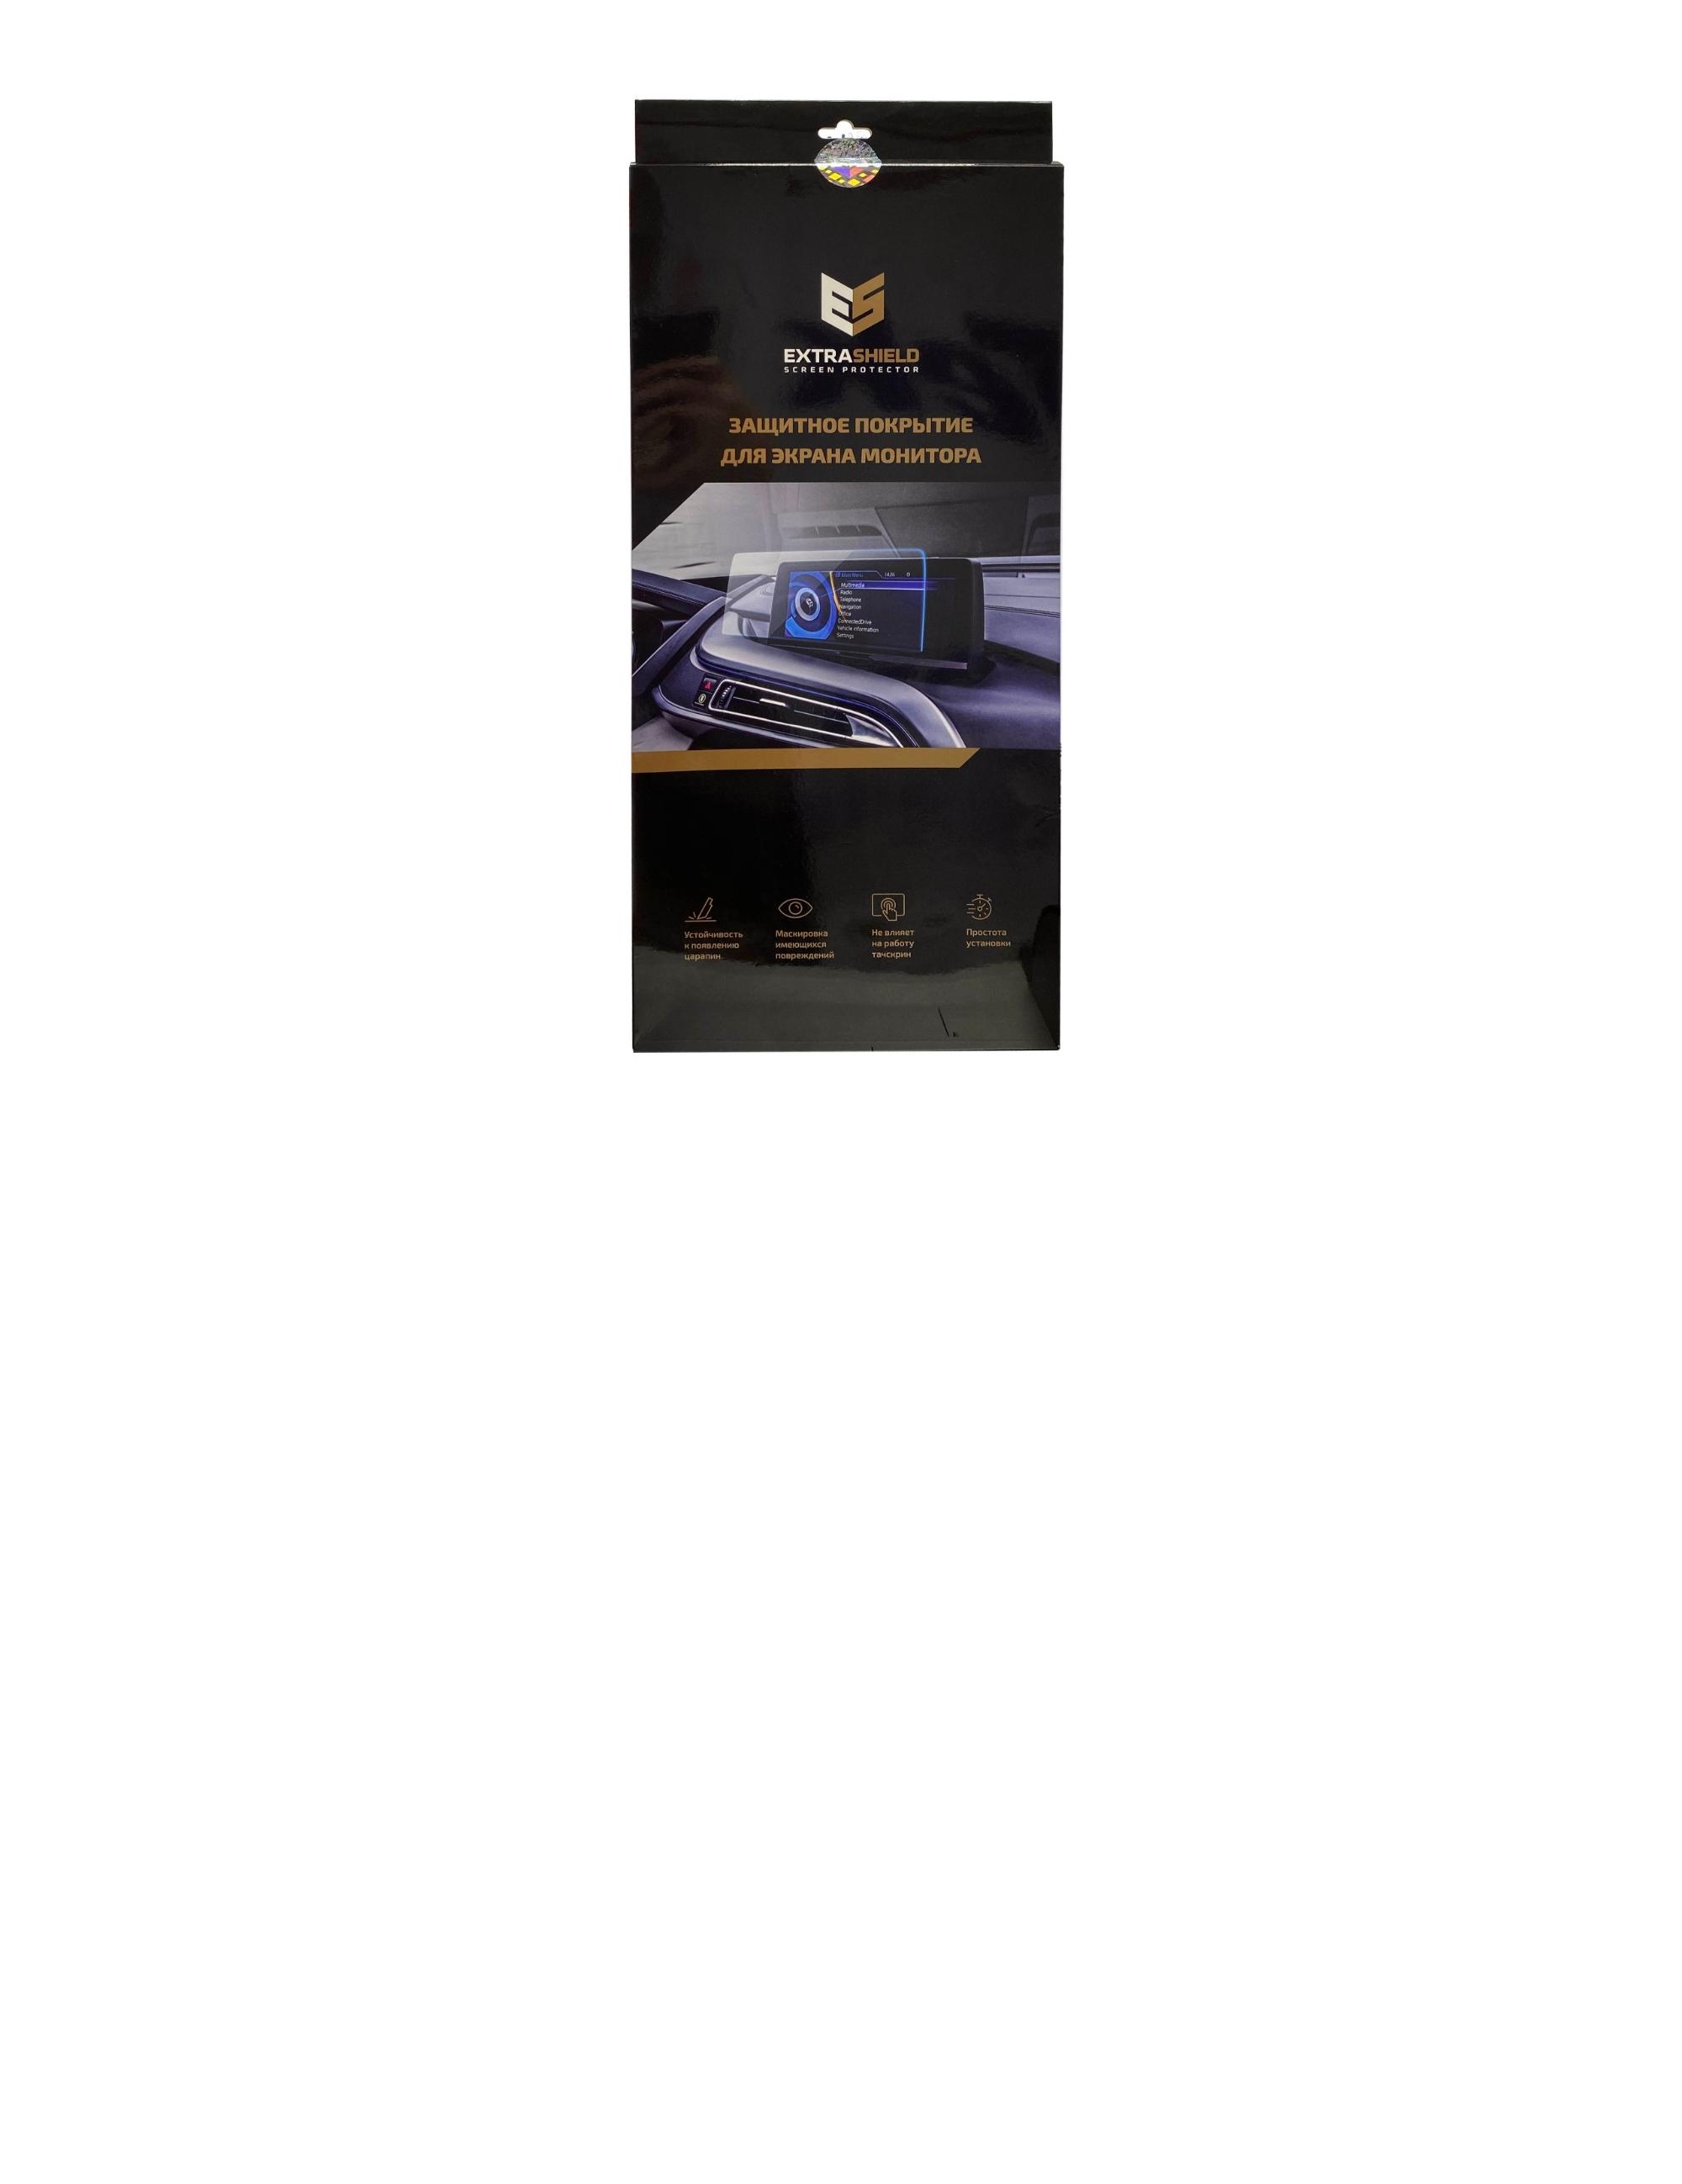 Audi A4 (B9) 2015 - н.в. мультимедиа MMI 8.3 Защитное стекло Матовая